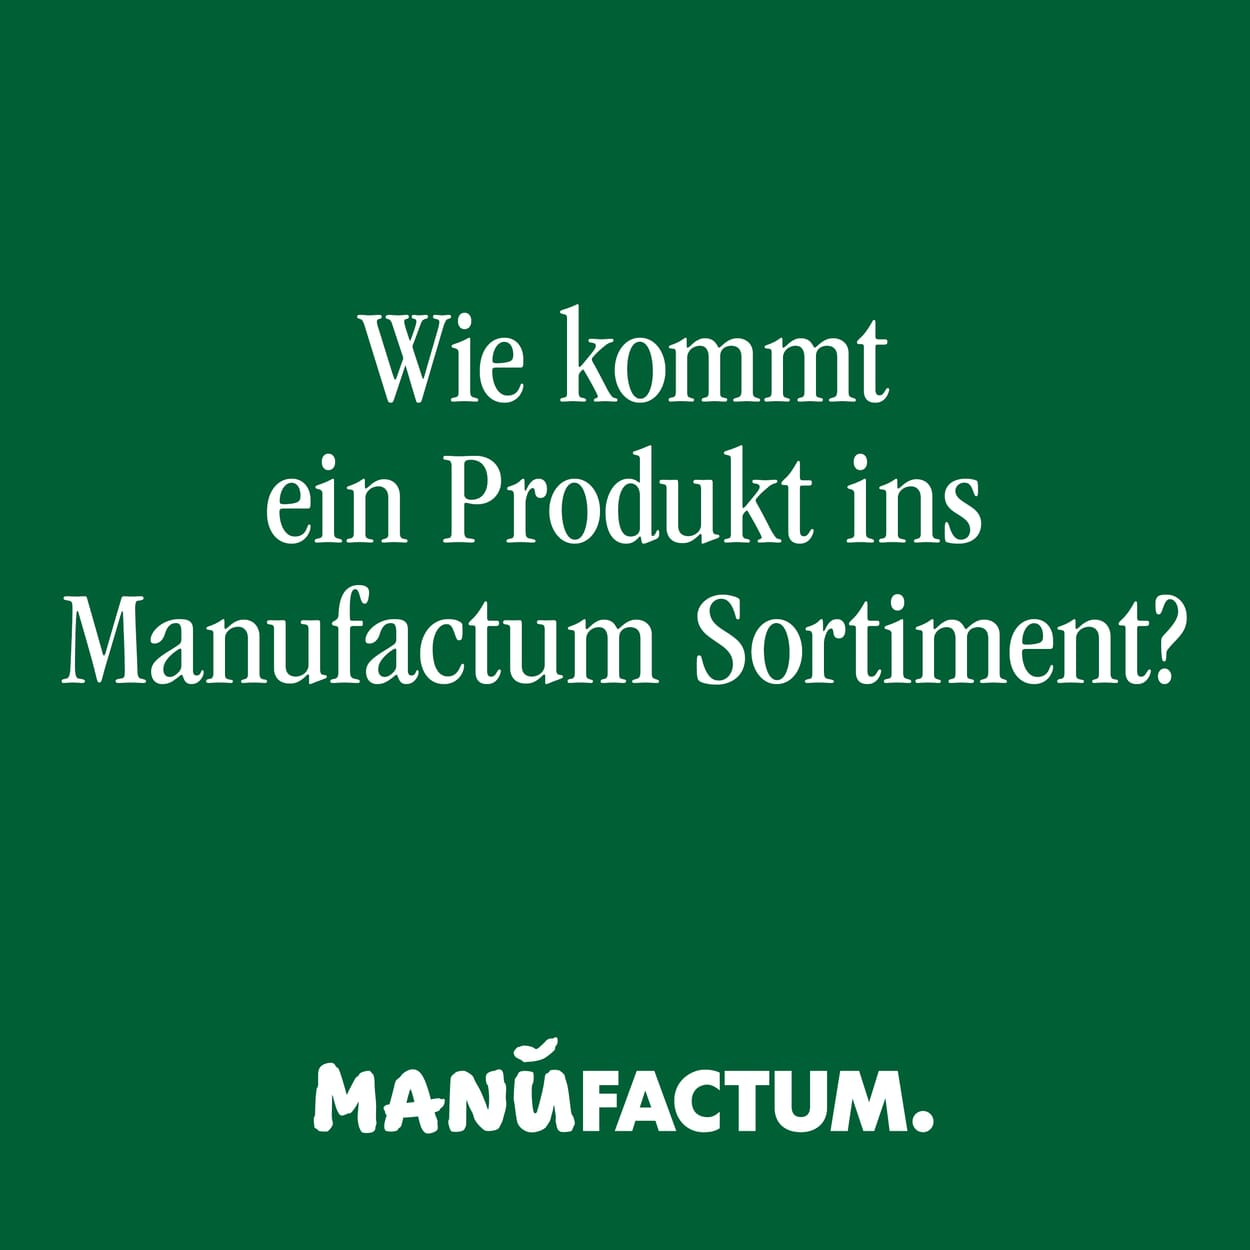 Manufactum Podcast Folge 6 - Wie kommt ein Produkt ins Manufactum Sortiment?